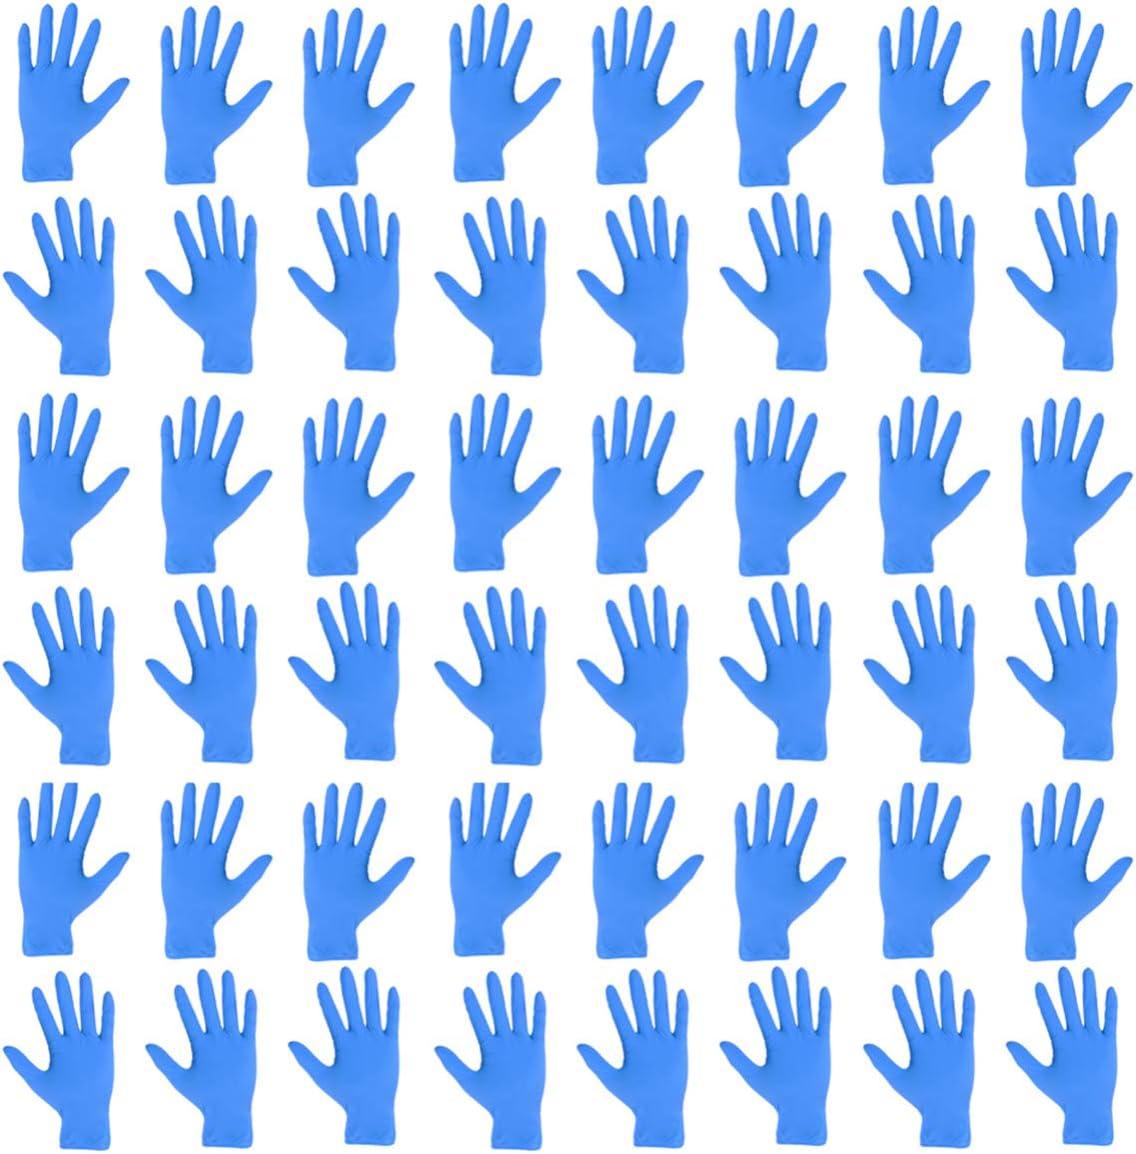 TOPBATHY 100 pz guanti monouso in nitrile guanti in nitrile industriale senza lattice senza polvere s